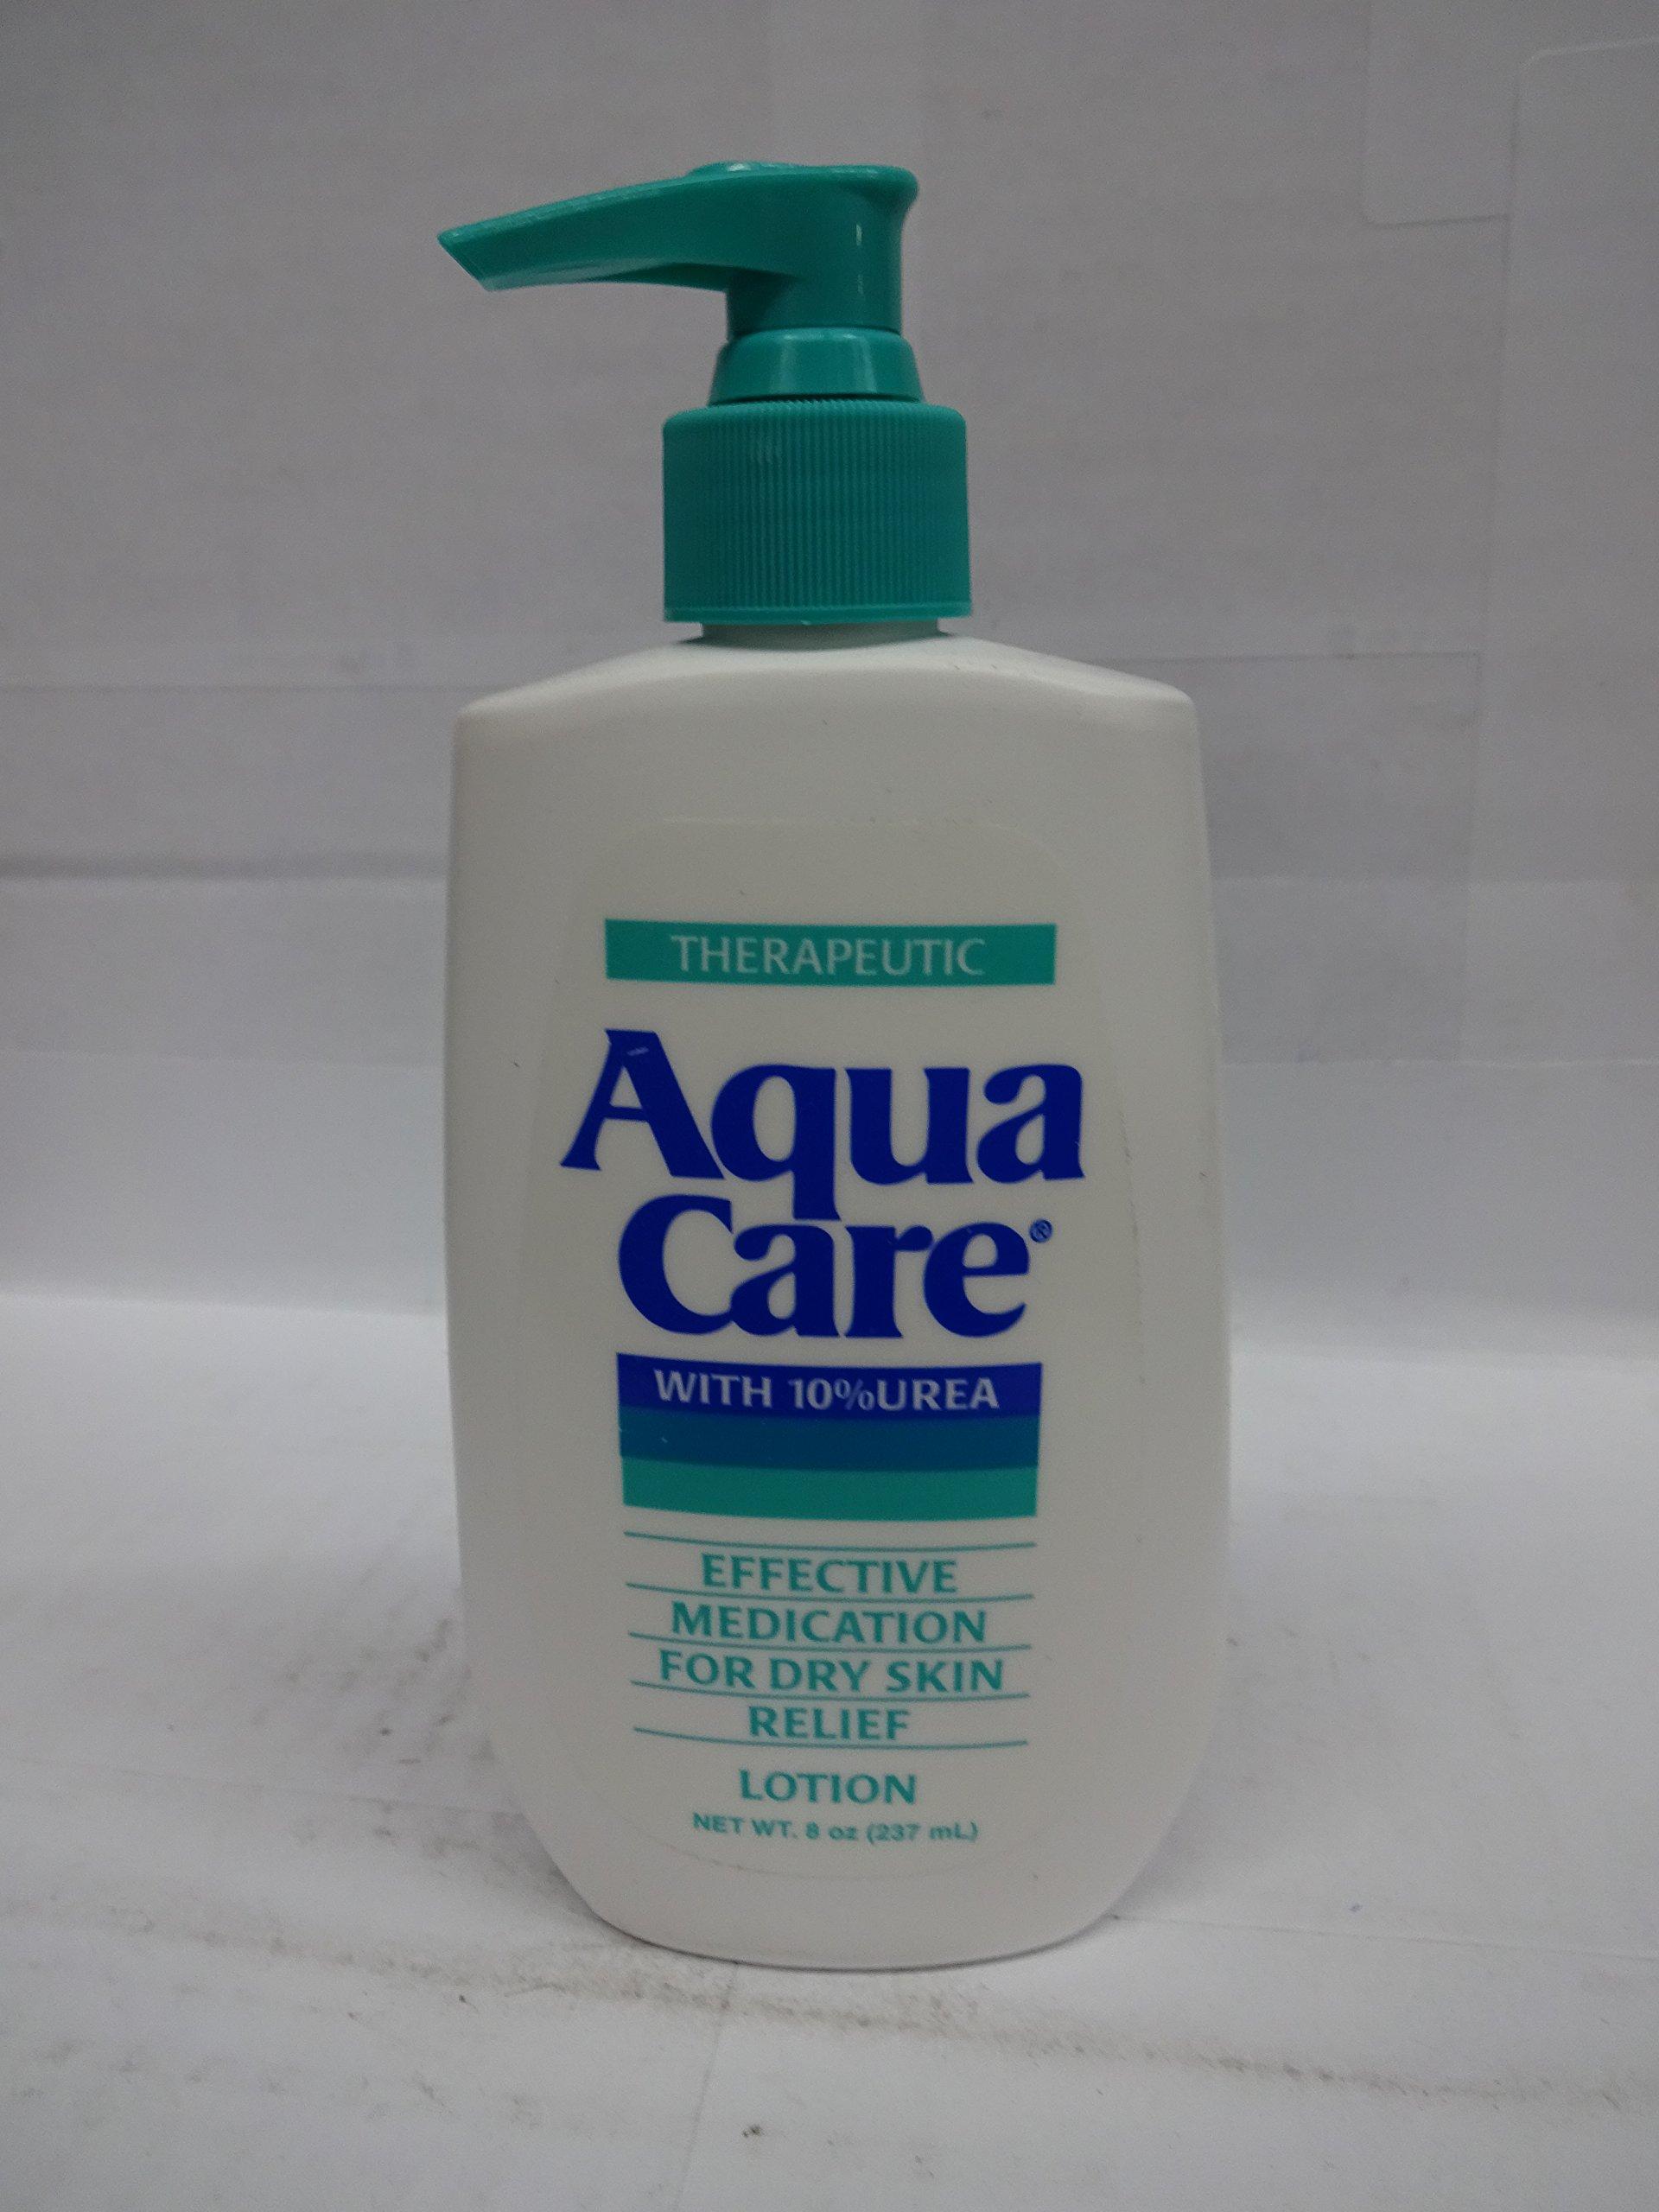 Aqua Care Lotion For Dry Skin, With 10 Percent Urea - 8 Oz, 2-pack